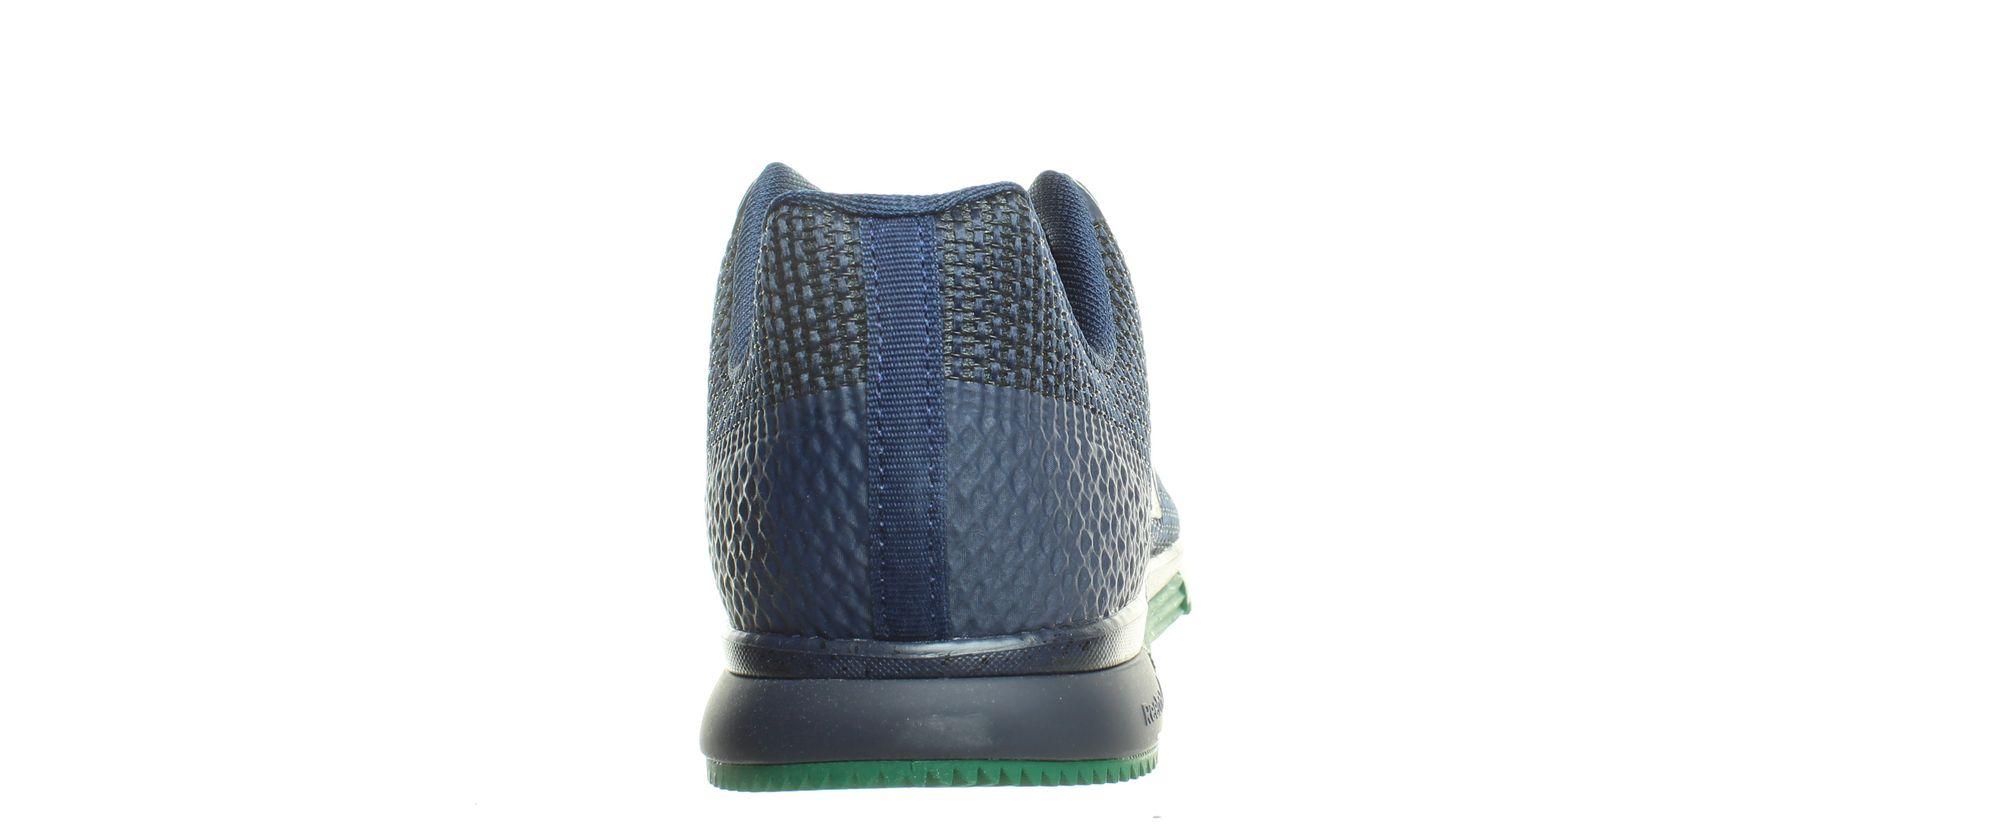 Reebok-Mens-Athletic-Speed-TR-Flexweave-Cross-Training-Shoes thumbnail 16